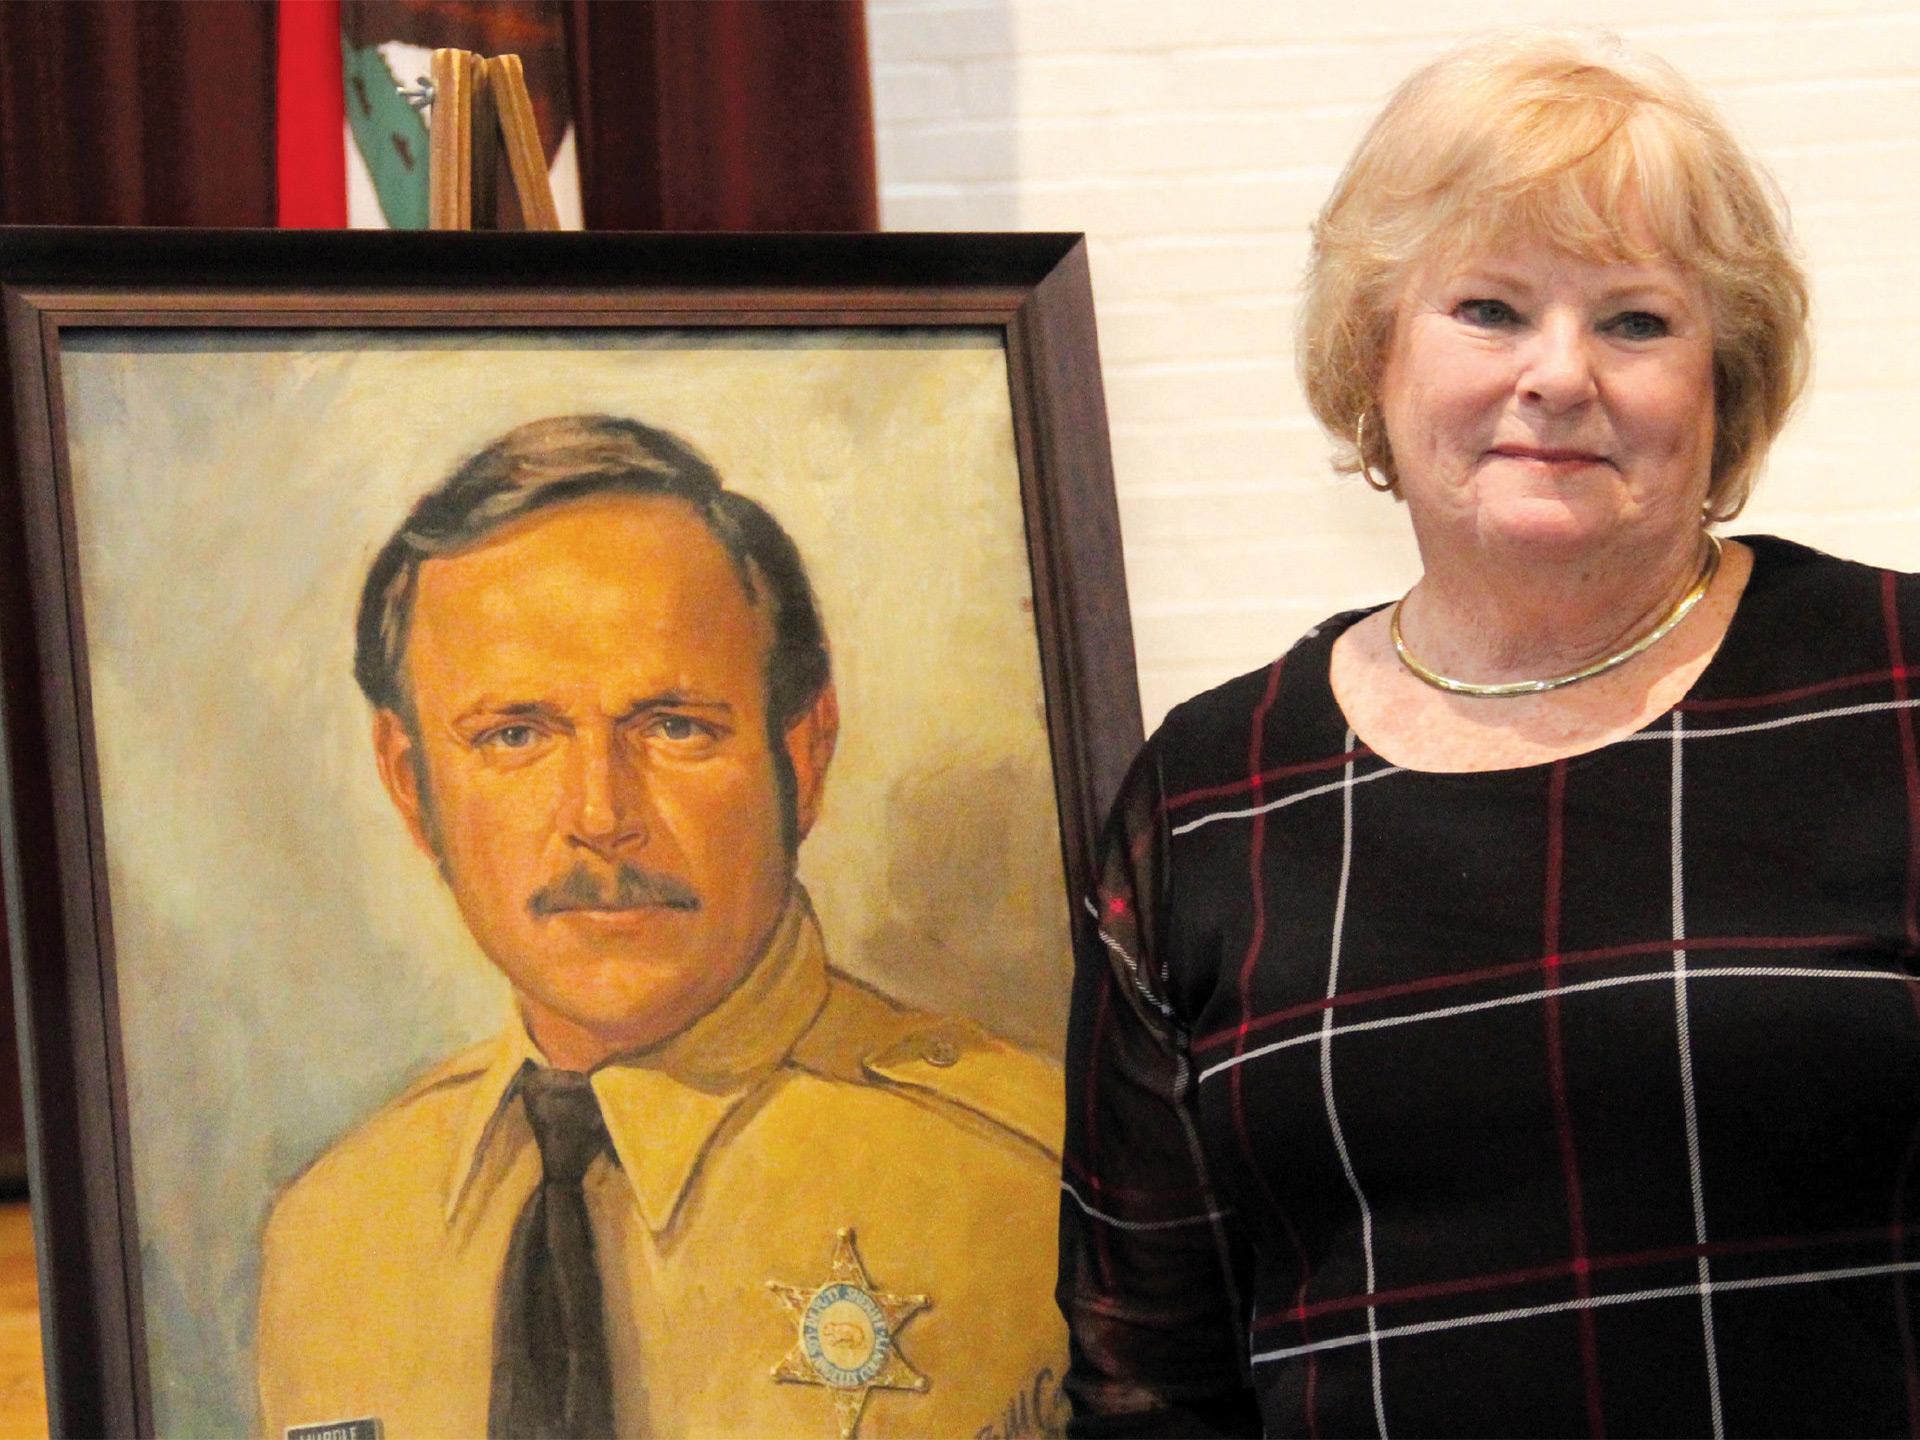 honoring-a-fallen-hero-deputy-didier-hurdle-1